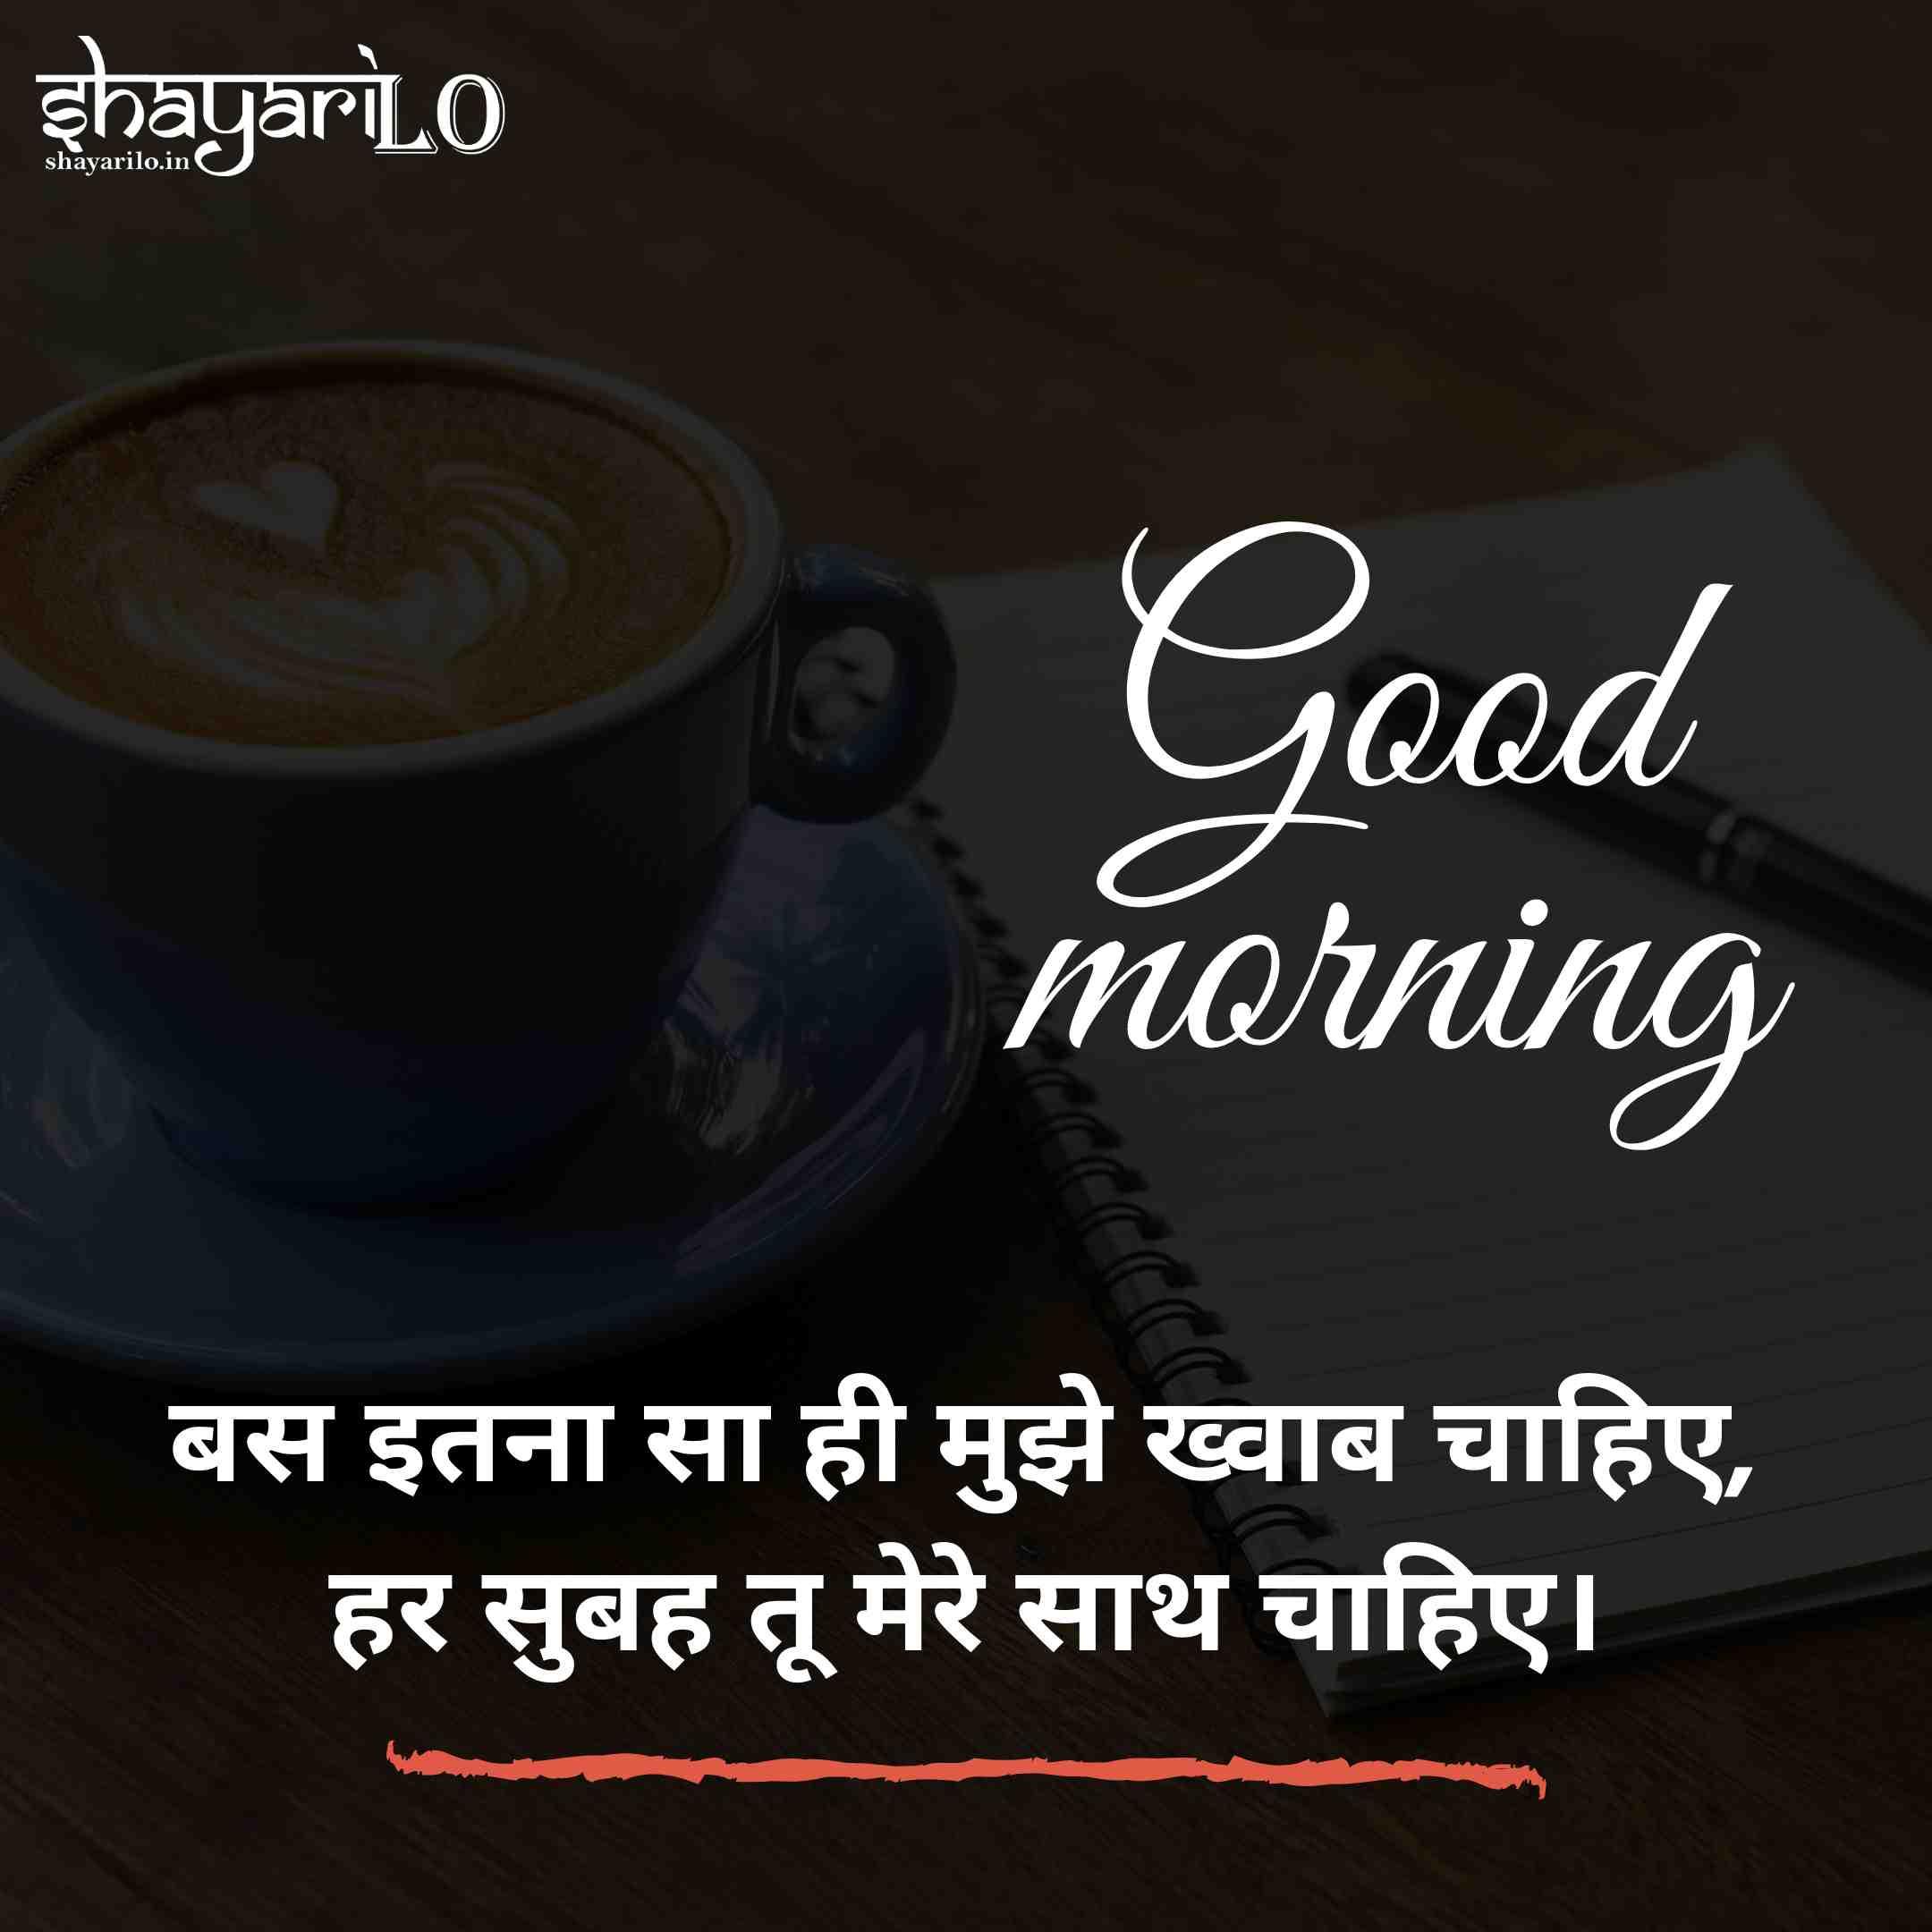 Lovely morning quotes and shayari